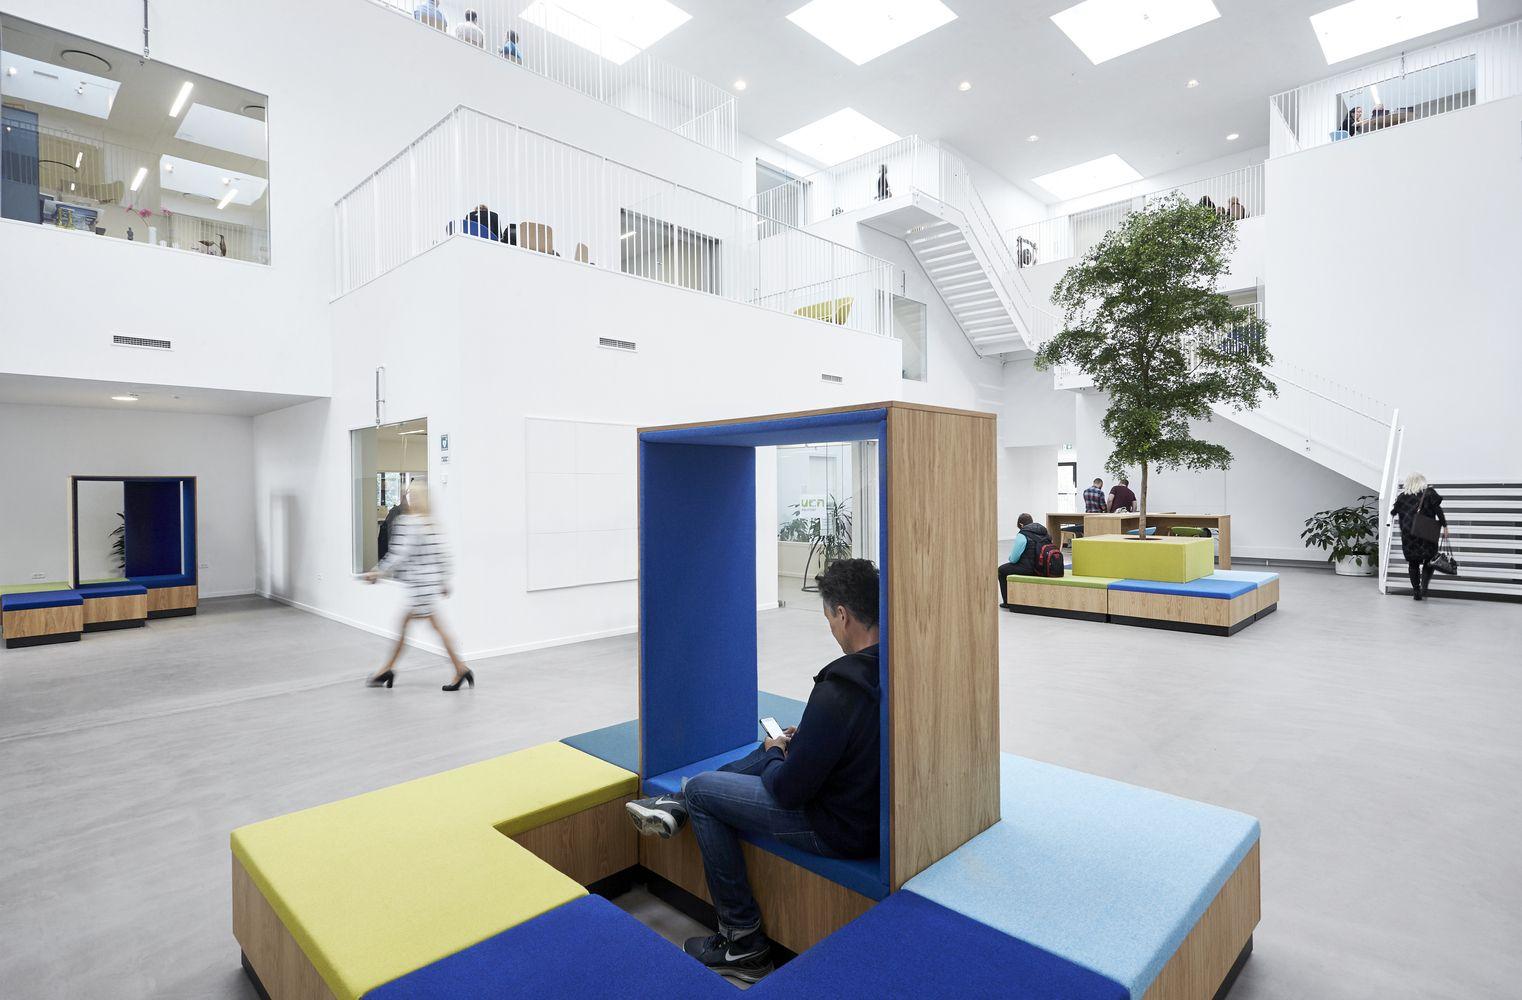 Gallery of University College North / ADEPT - 16